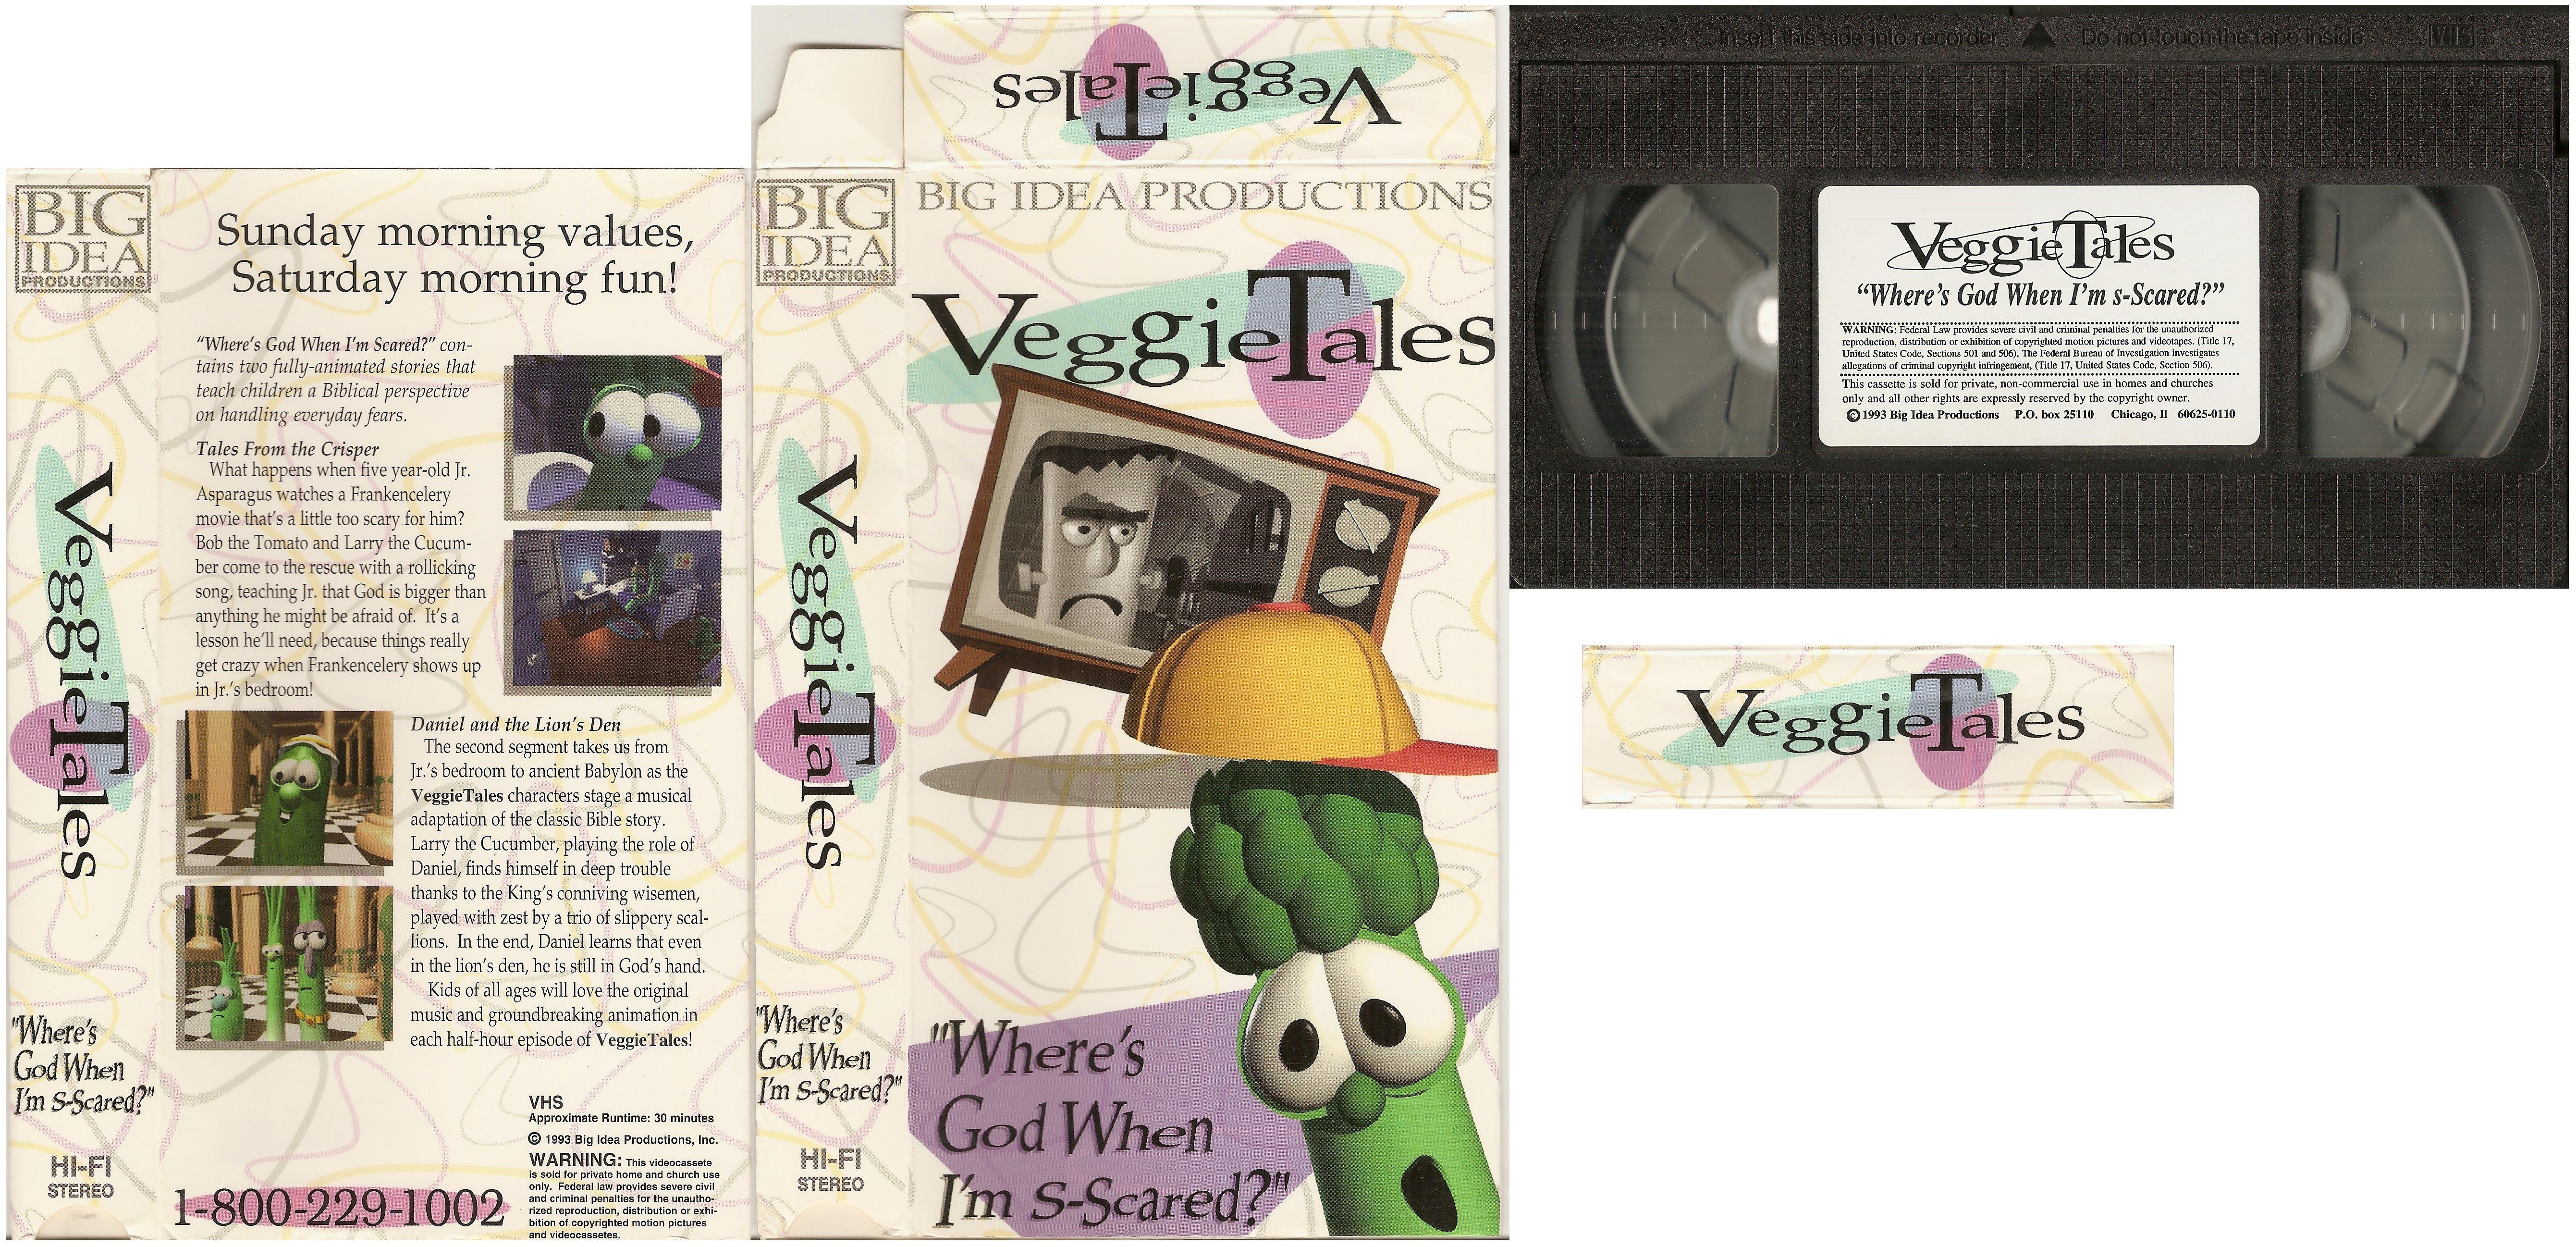 VeggieTales: Where's God When I'm S-Scared? (Original 1993 Version)